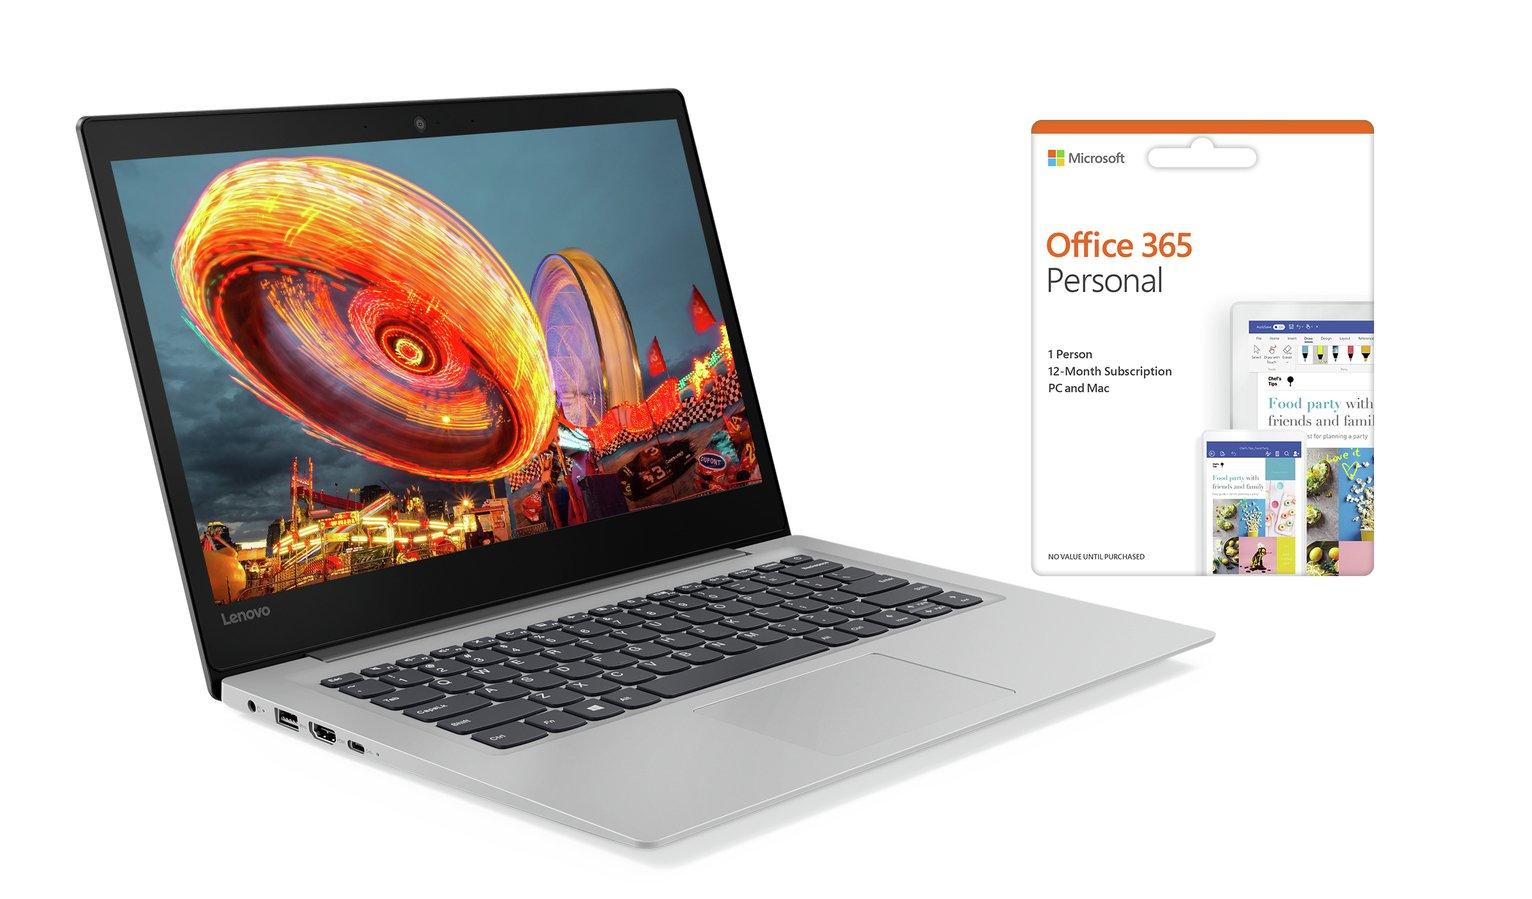 Lenovo IdeaPad S130 14 Inch Celeron 4GB 64GB Cloudbook -Grey